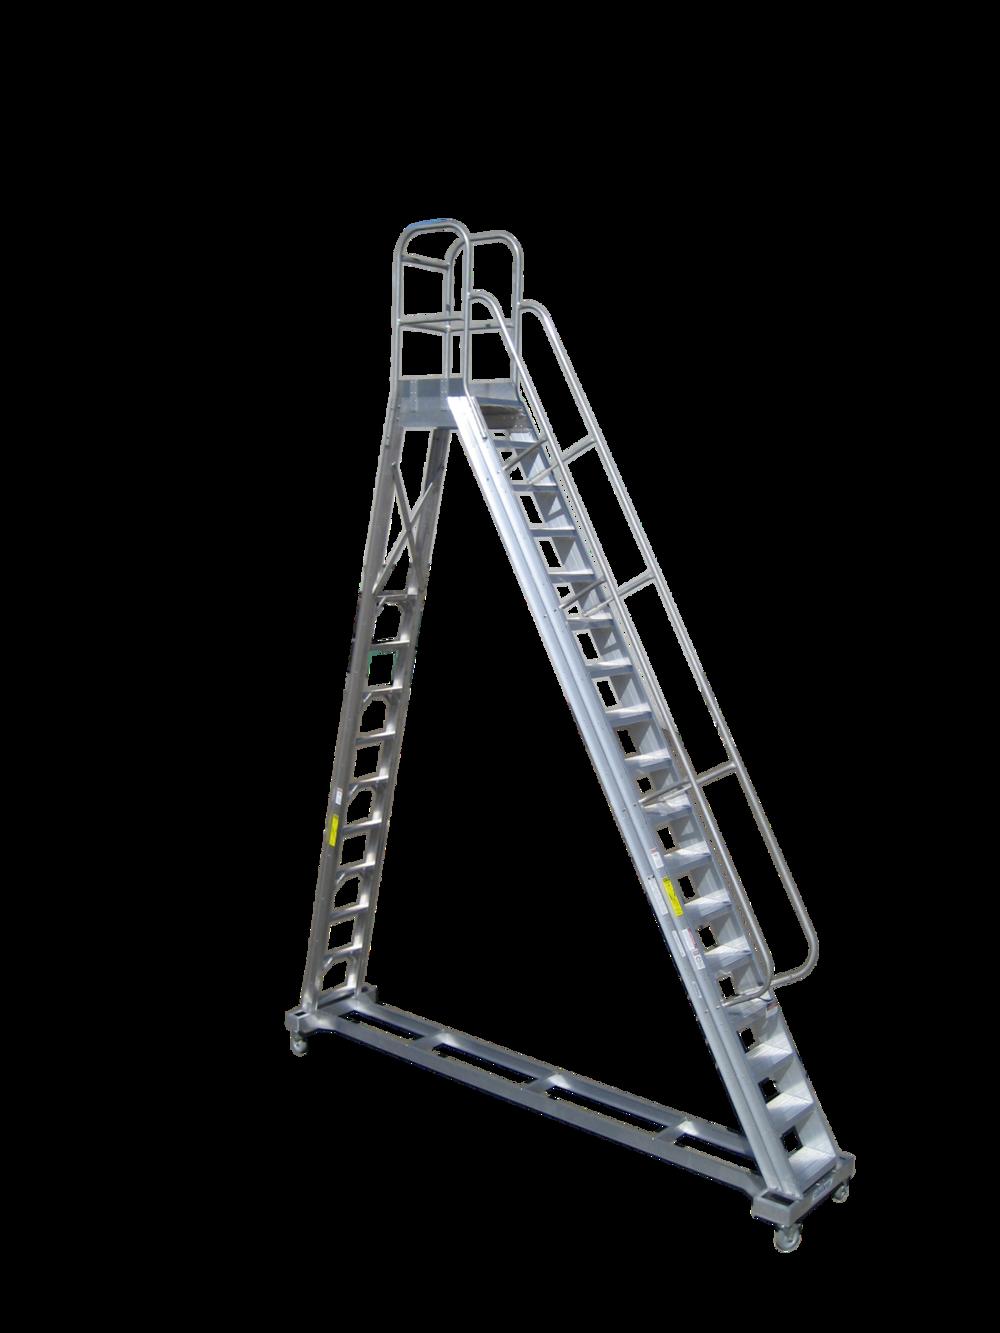 Stokes Barrel Room Ladder